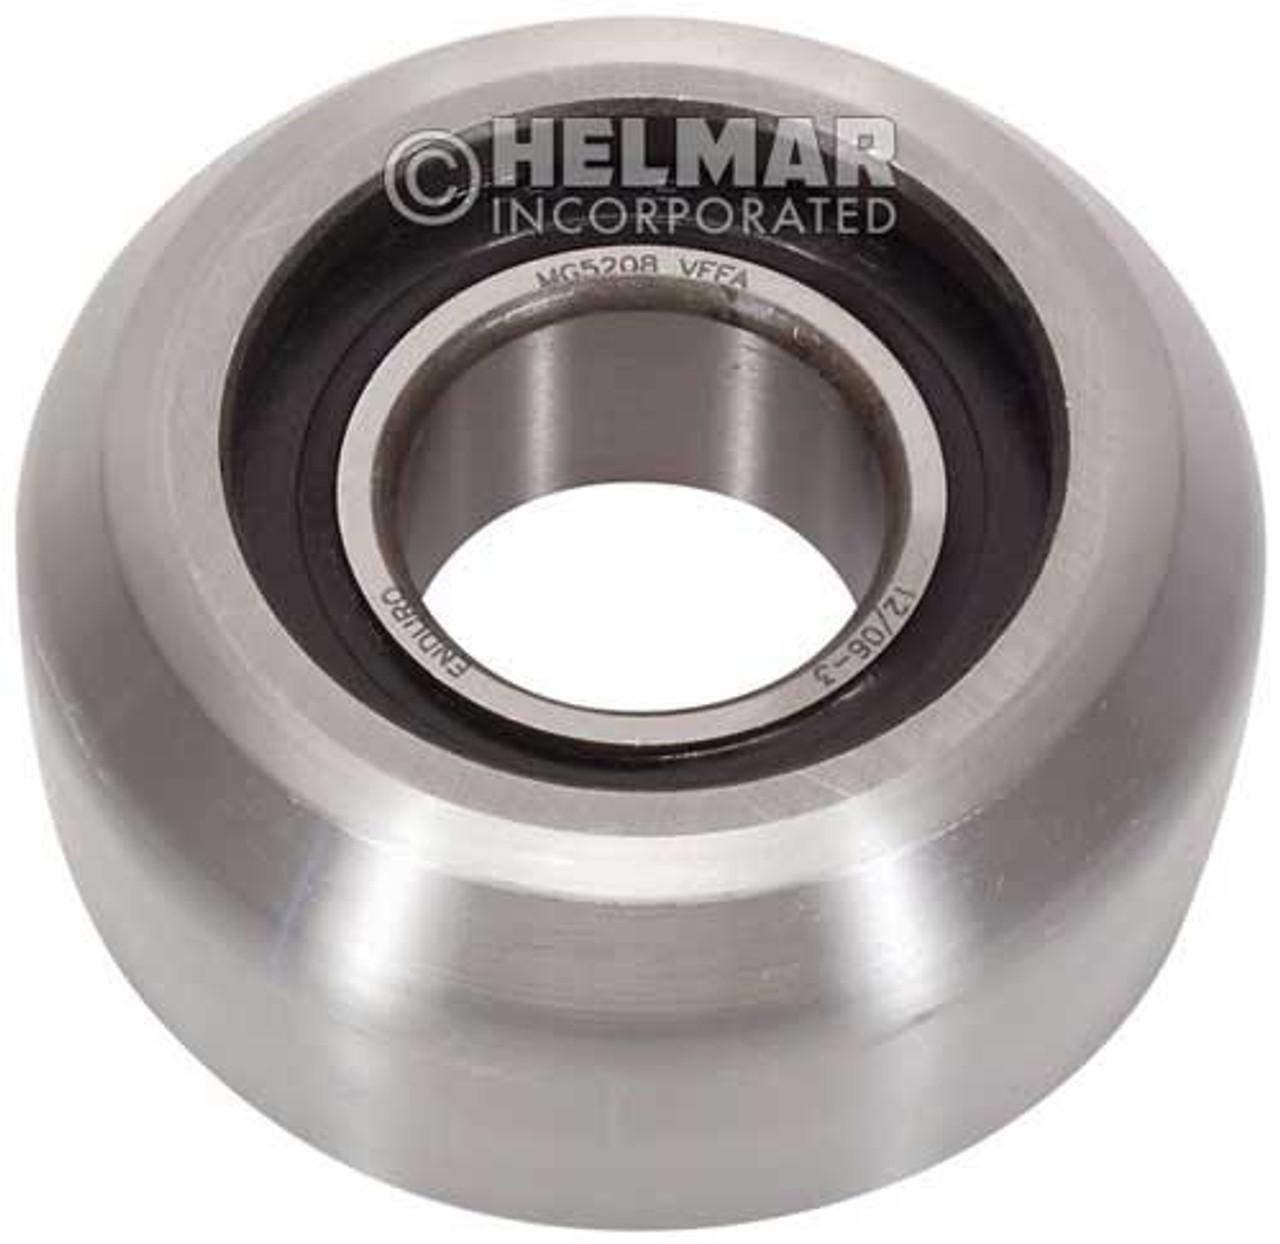 1343005 Hyster Mast Roller Bearing 42.9mm Wide, 103.35mm Outer Diameter, 39.70mm Inner Diameter